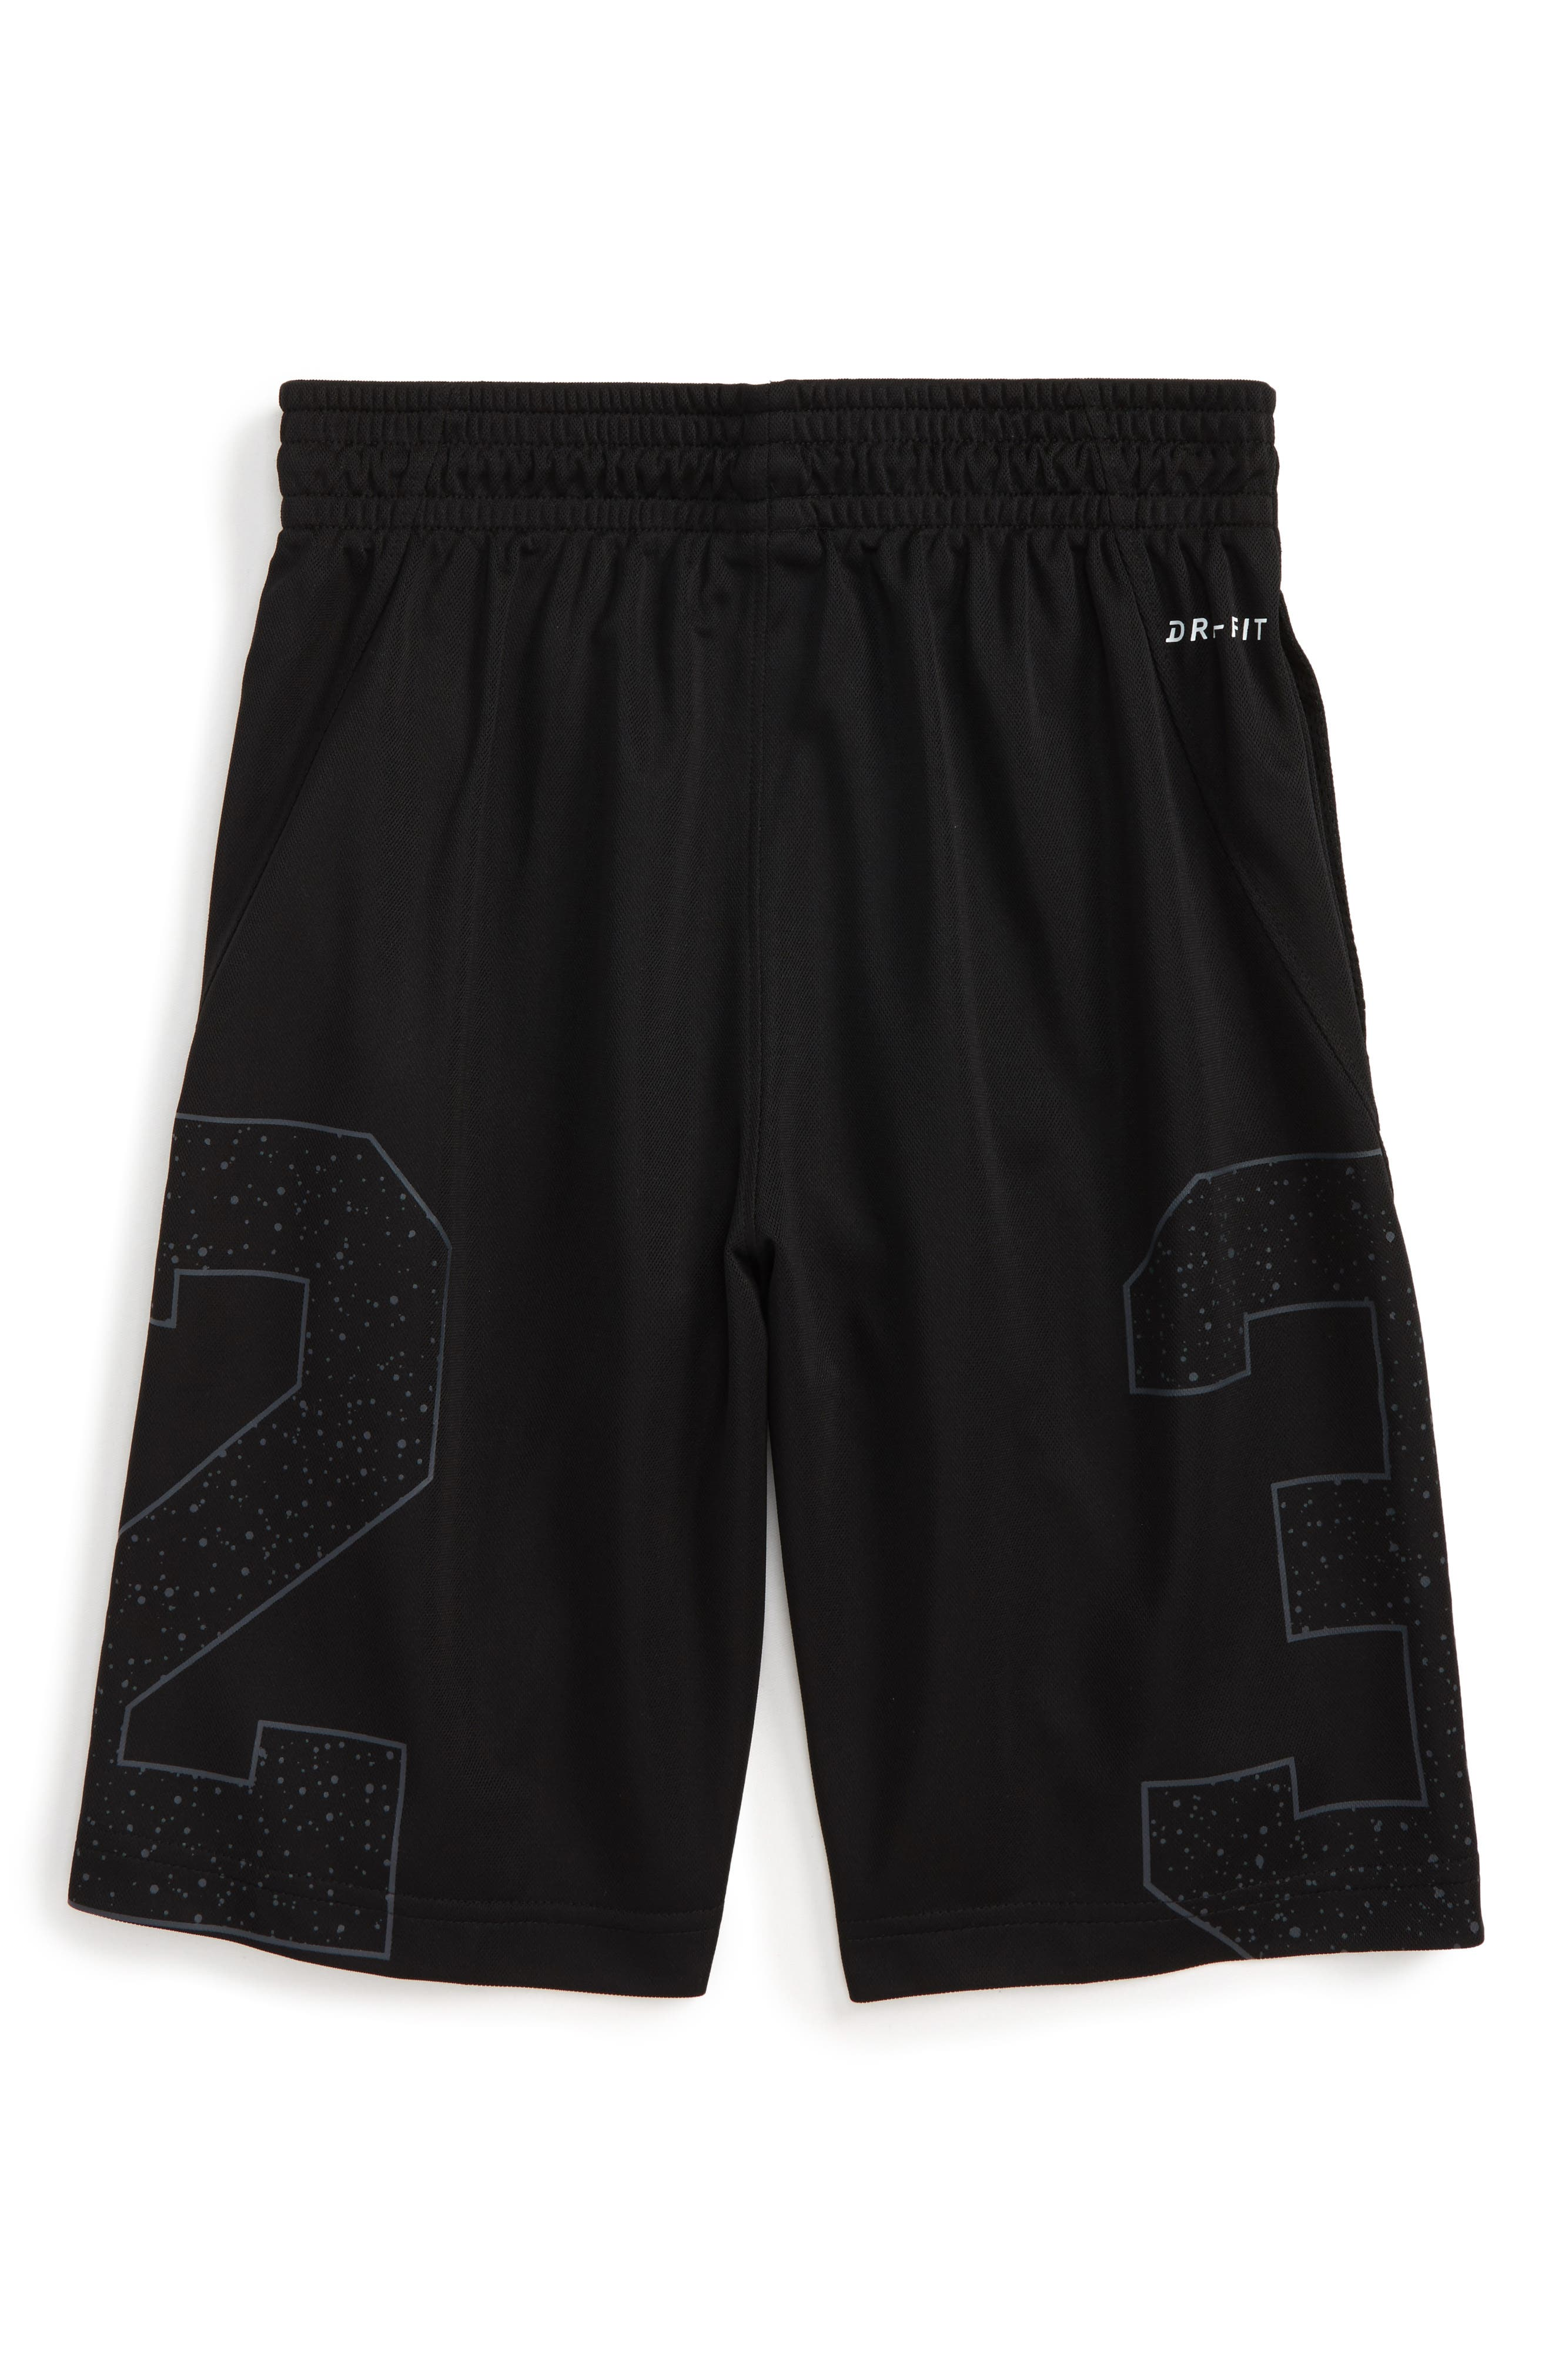 Jordan Speckle 23 Basketball Shorts,                             Alternate thumbnail 2, color,                             004